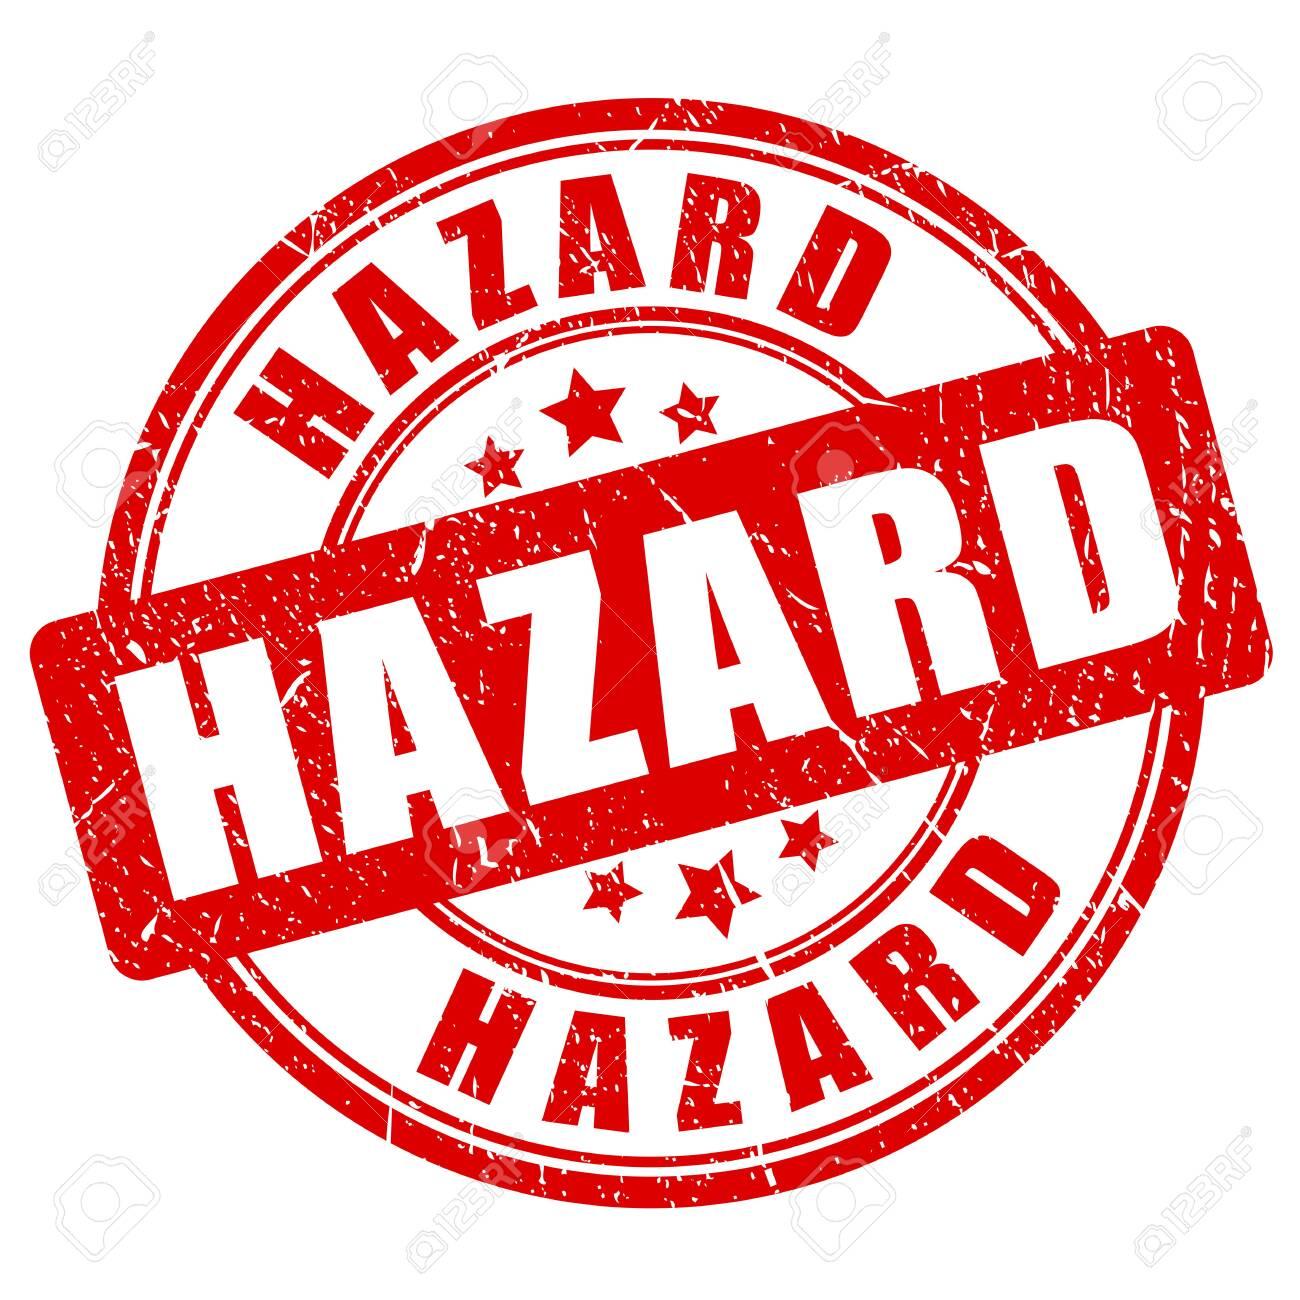 Red grunge hazard vector stamp isolated on white background - 123990574